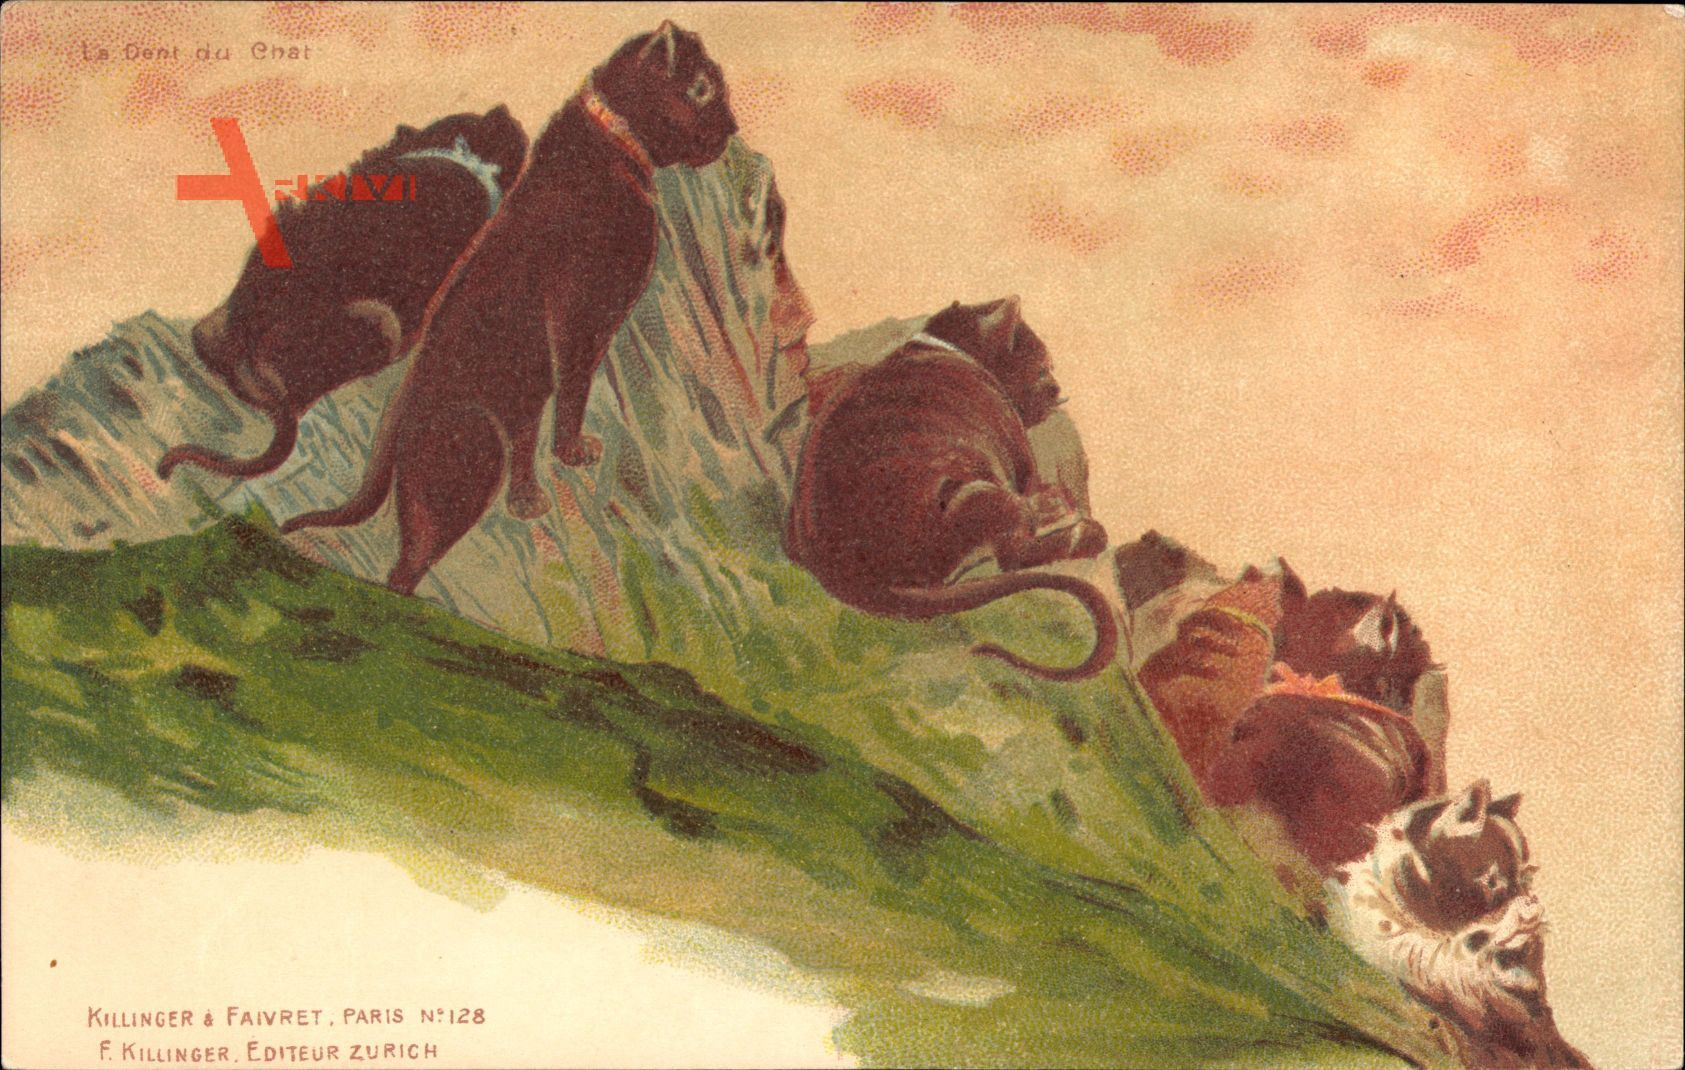 Le Dent du Chat, Berggesichter, Katzen, Killinger No 128